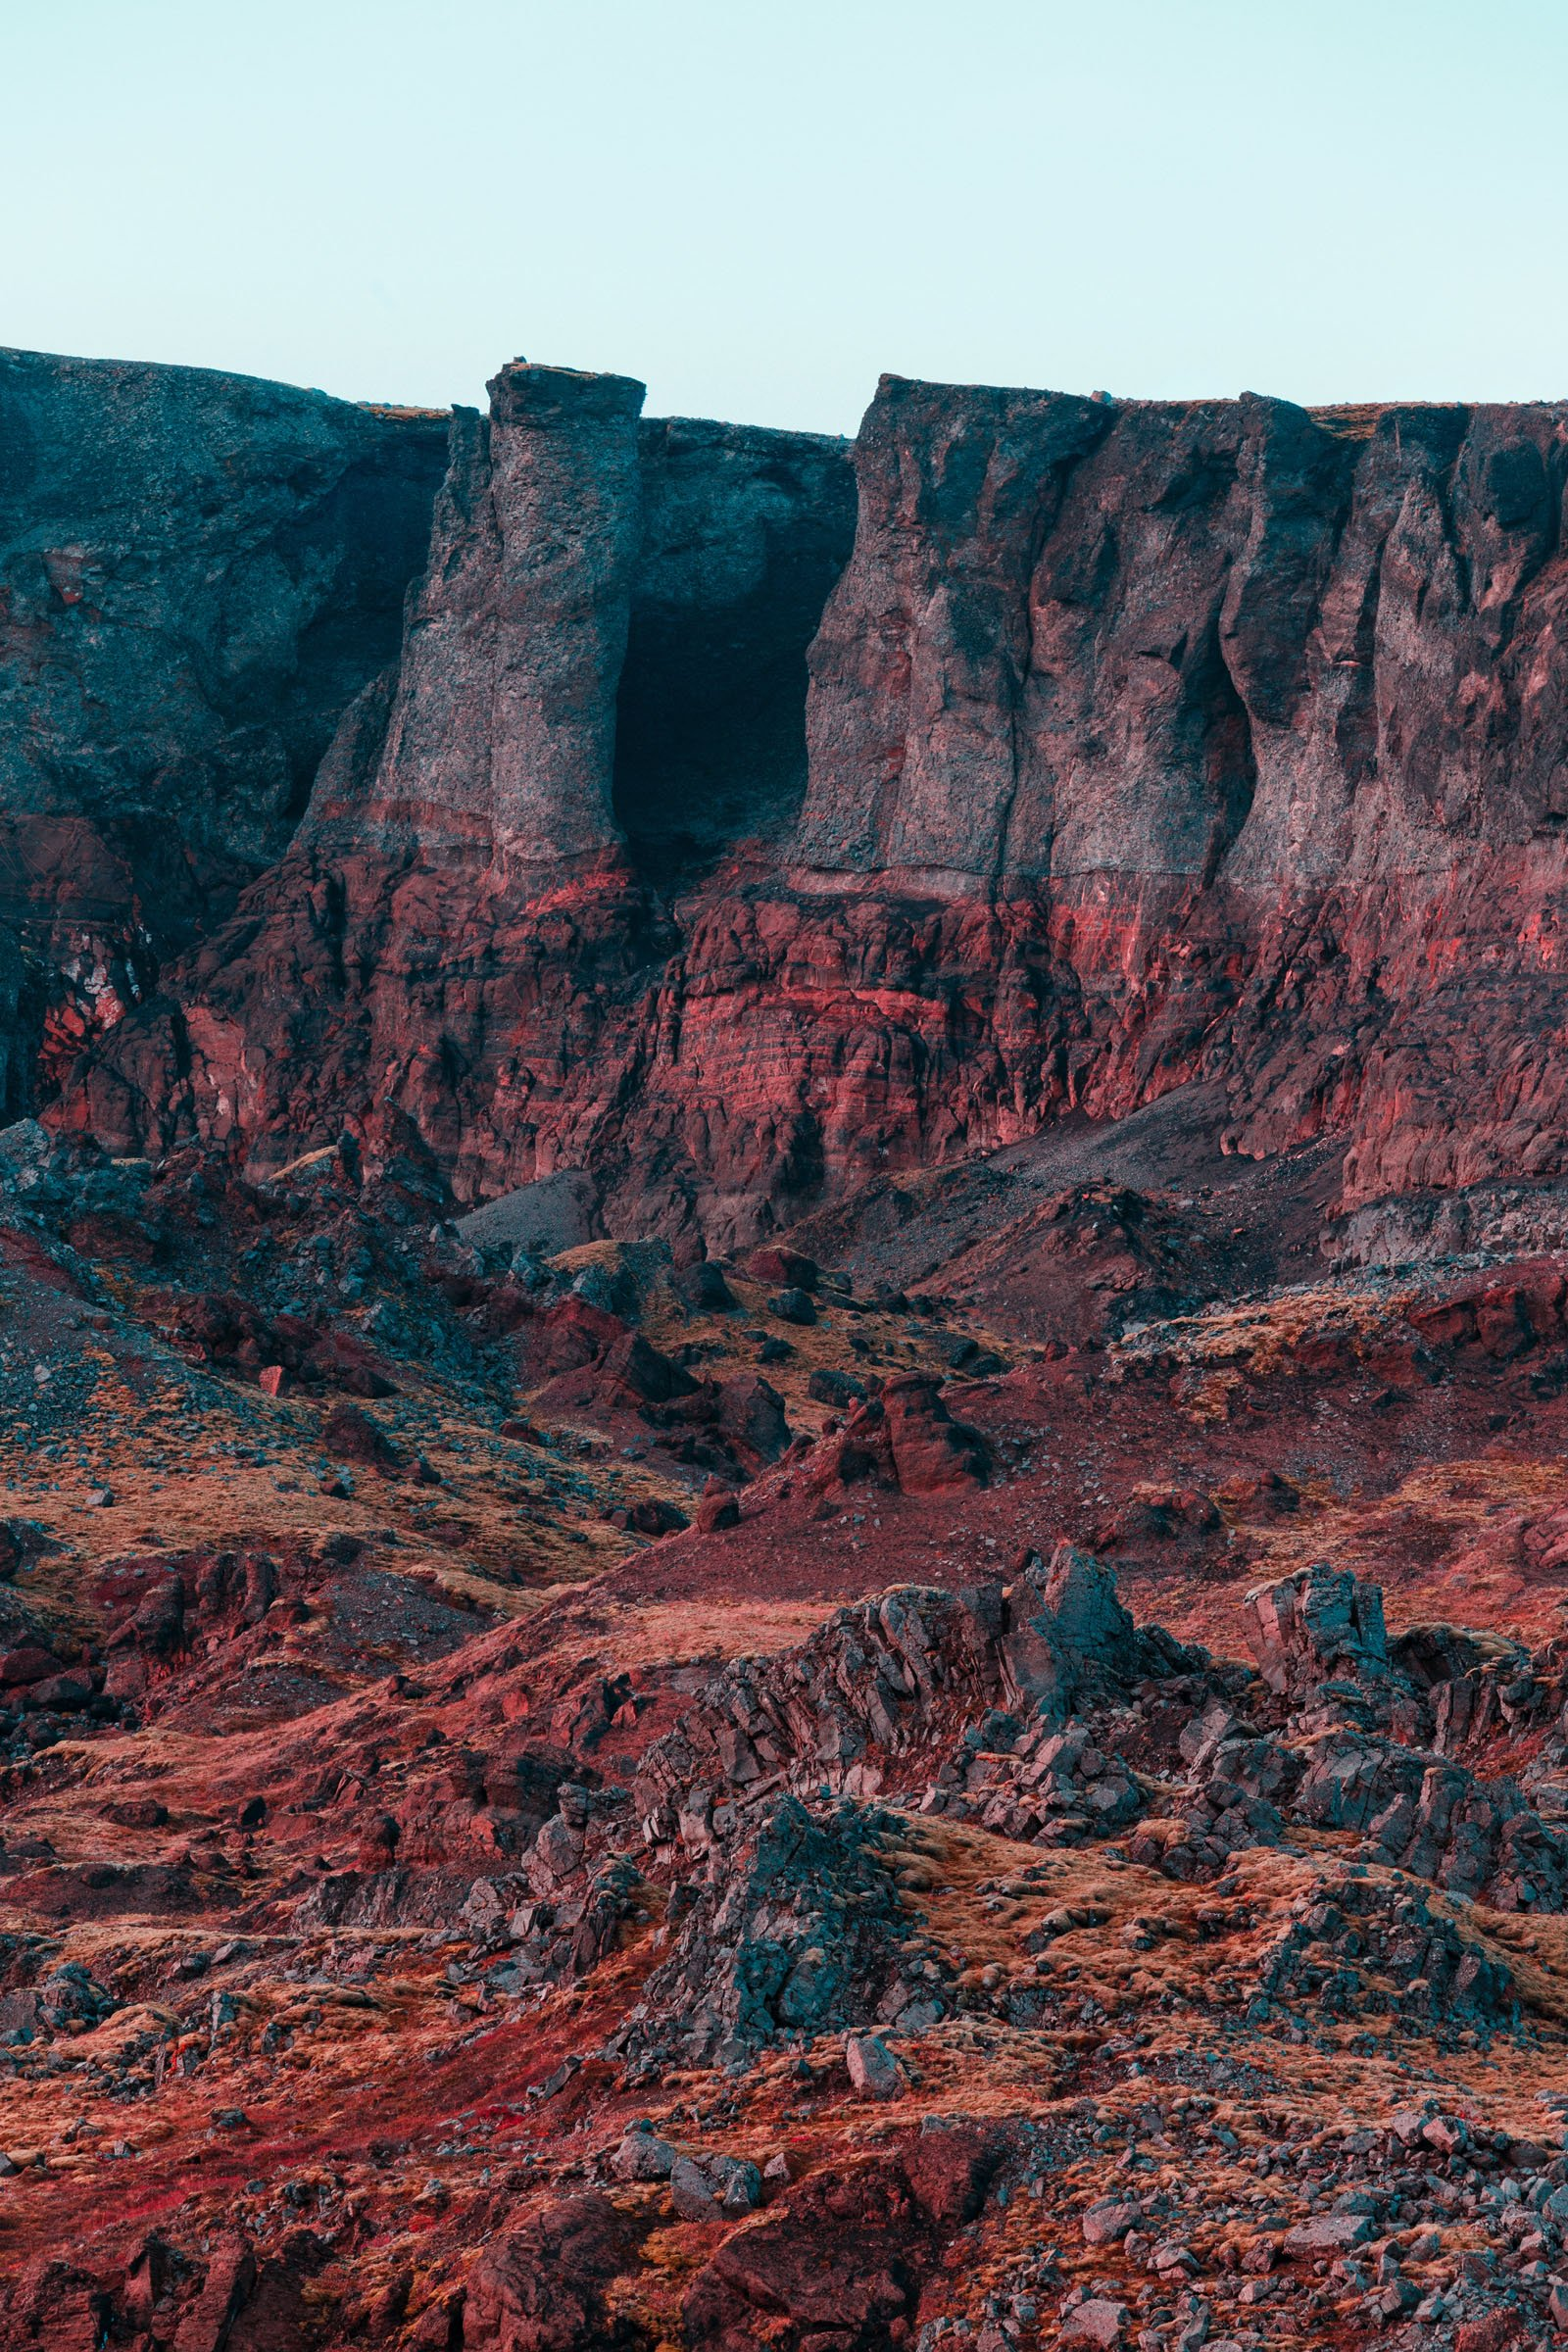 Fotografie a colori, paesaggi dall'Islanda, montagne rosse